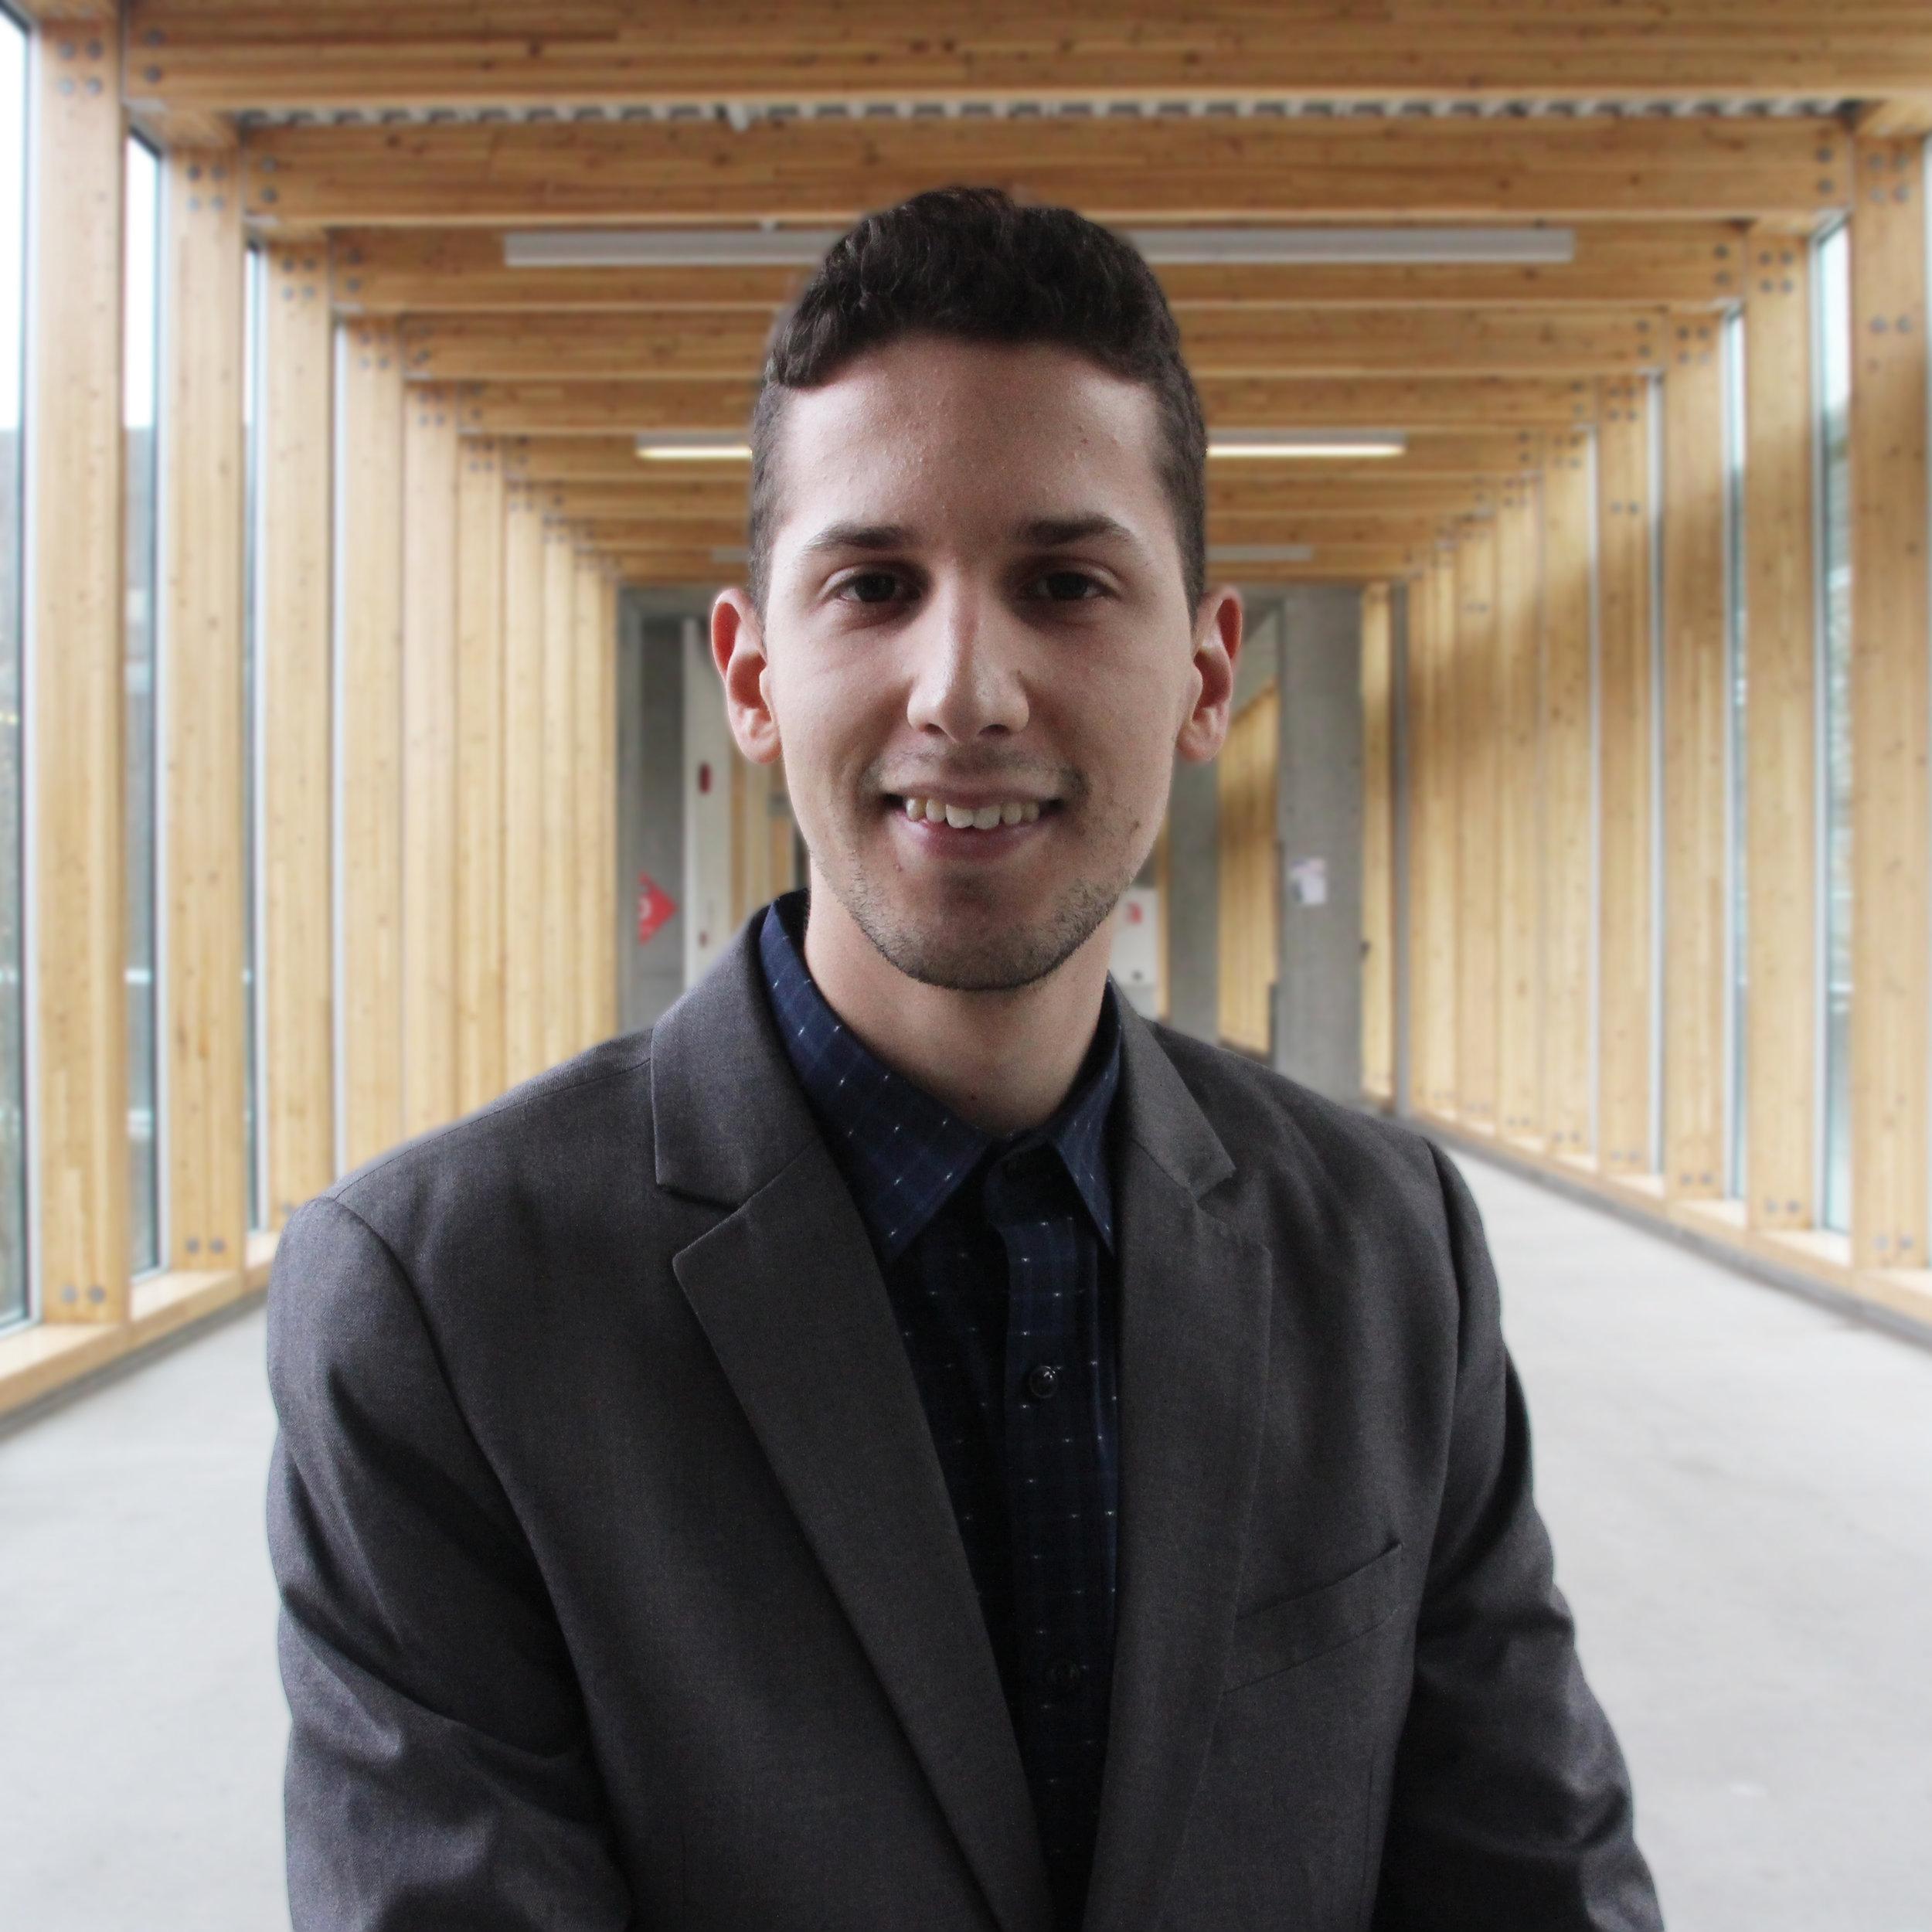 Nikola Surjanovic - Industry Partnership Coordinator